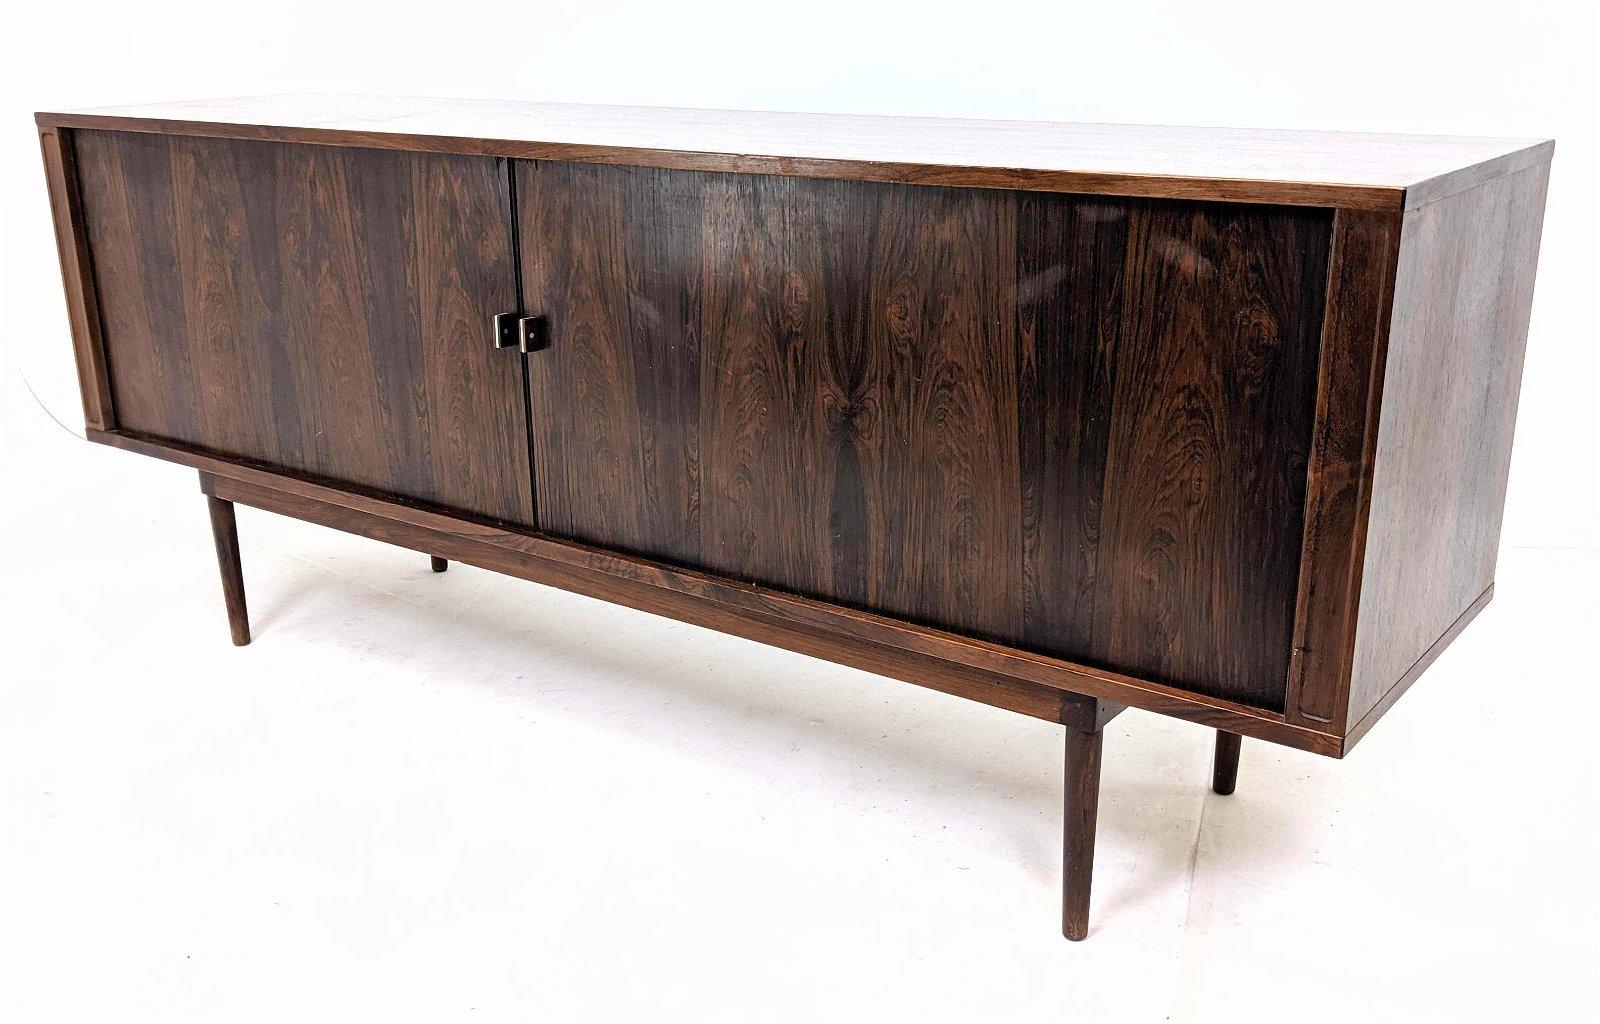 LOVIG 1969 Danish Modern Rosewood Credenza Sideboard